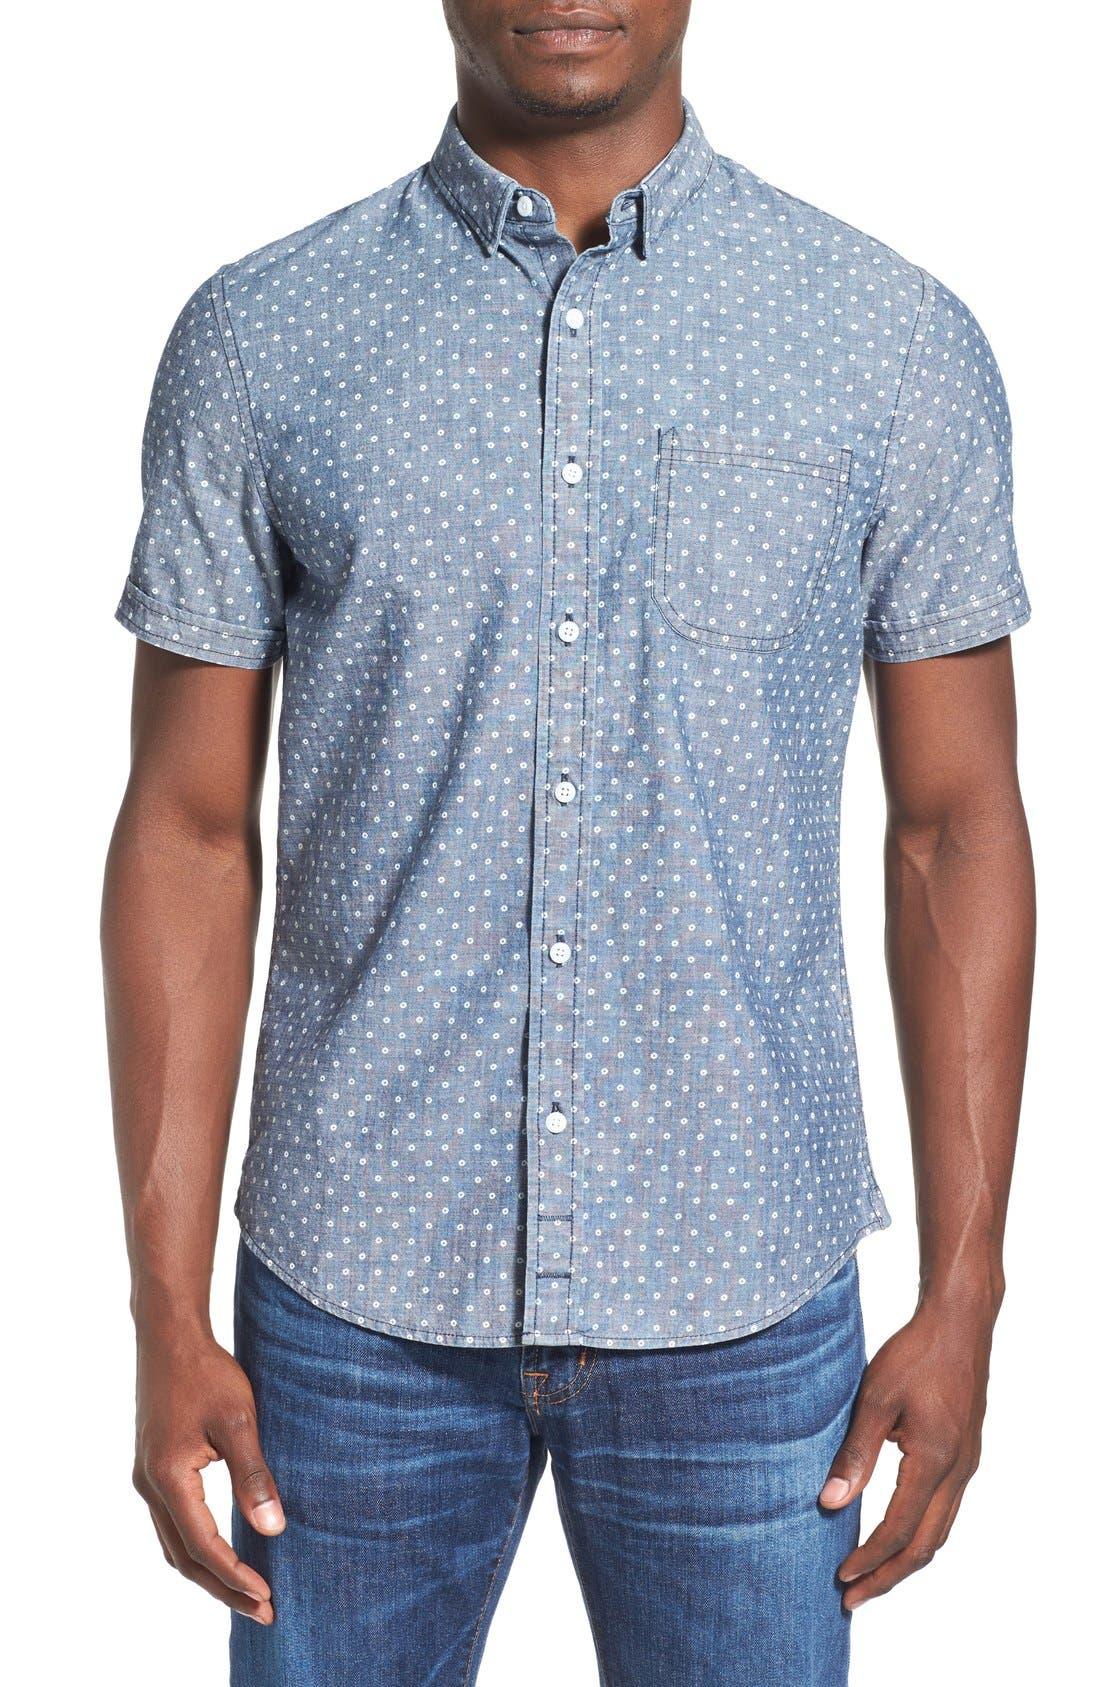 'Whitman' Trim Fit Short Sleeve Dot Print Chambray Shirt,                         Main,                         color, Blue Estate Dot